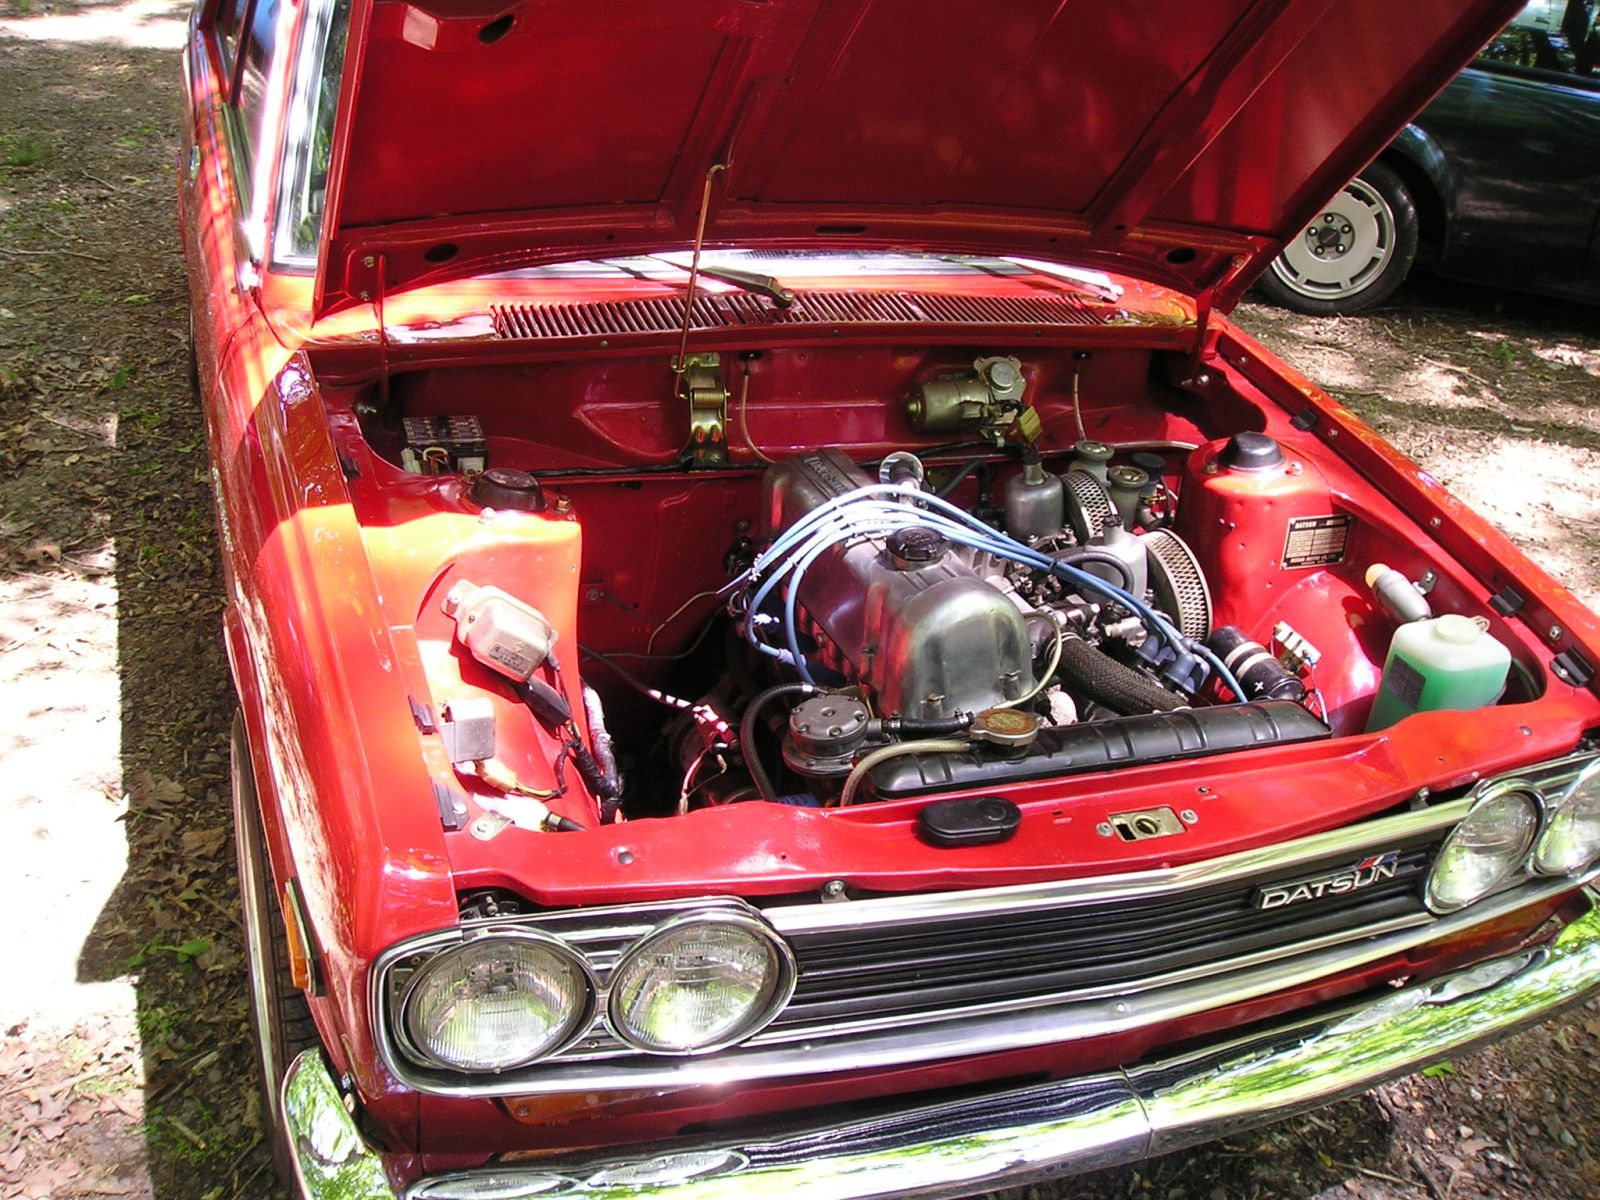 Sam's super clean engine